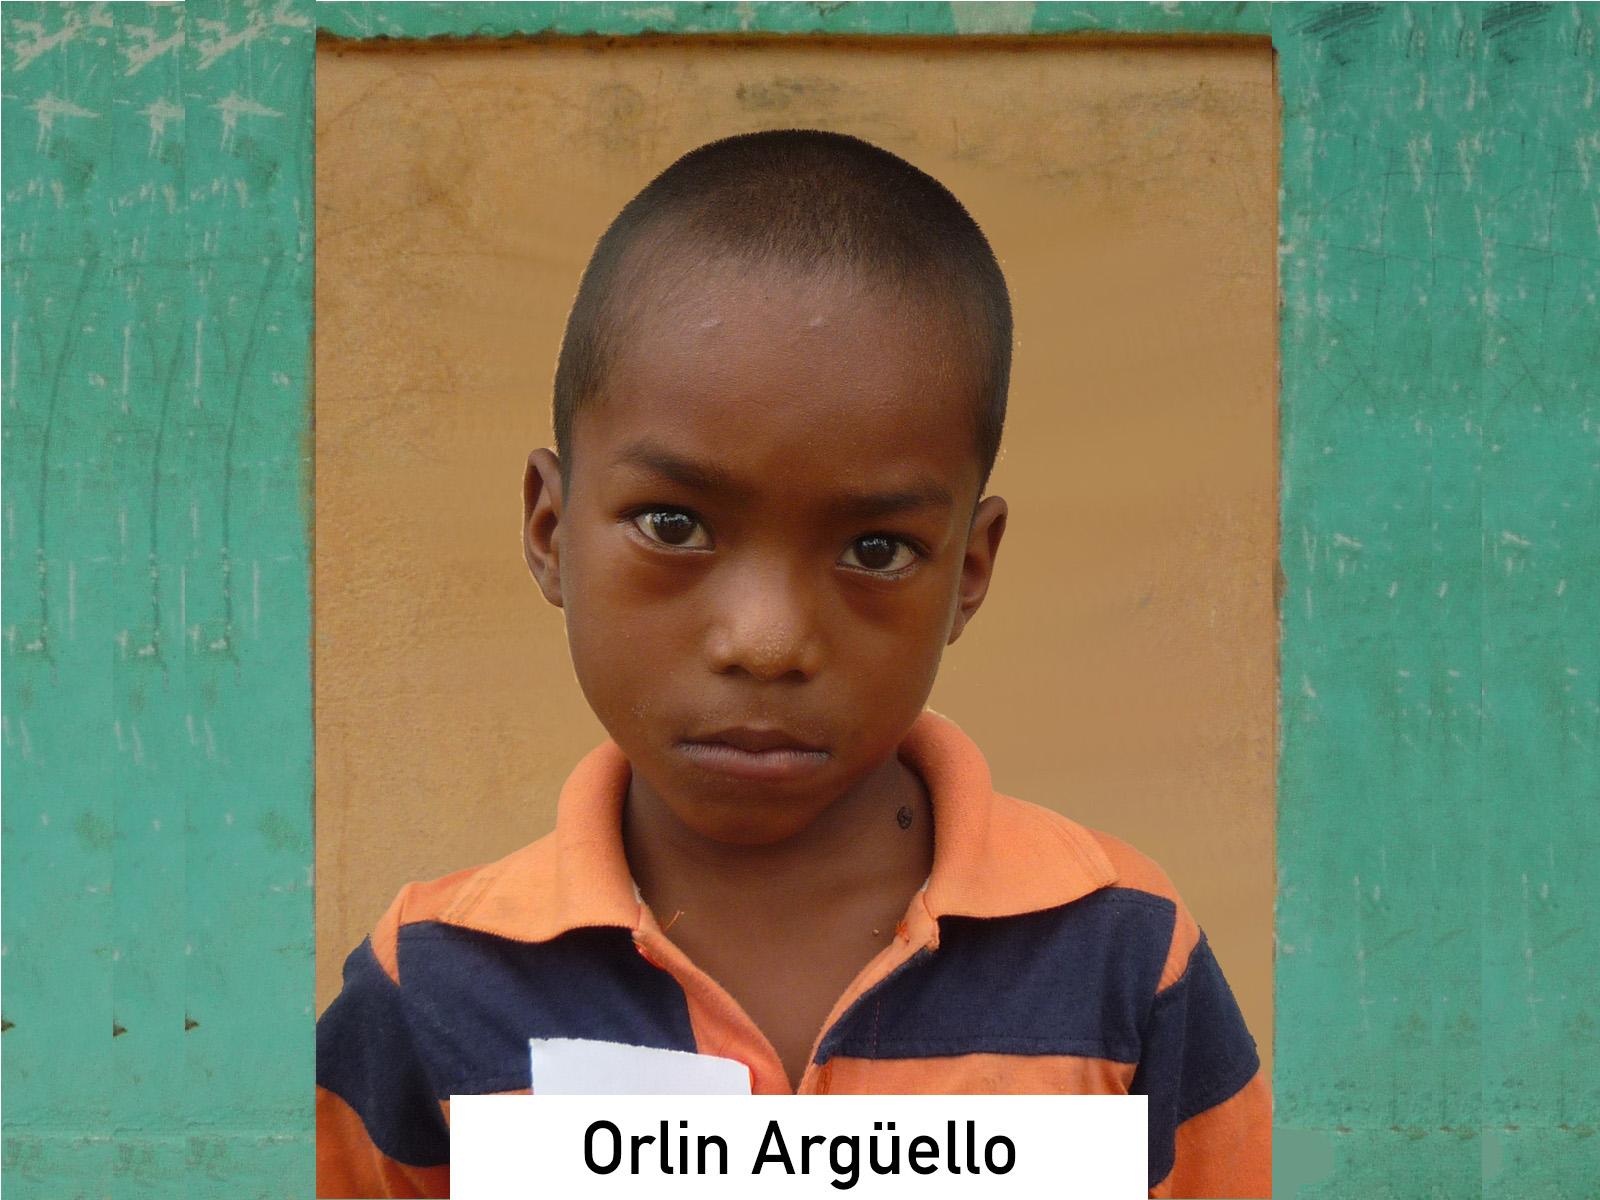 020 - Orlin Argüello.jpg